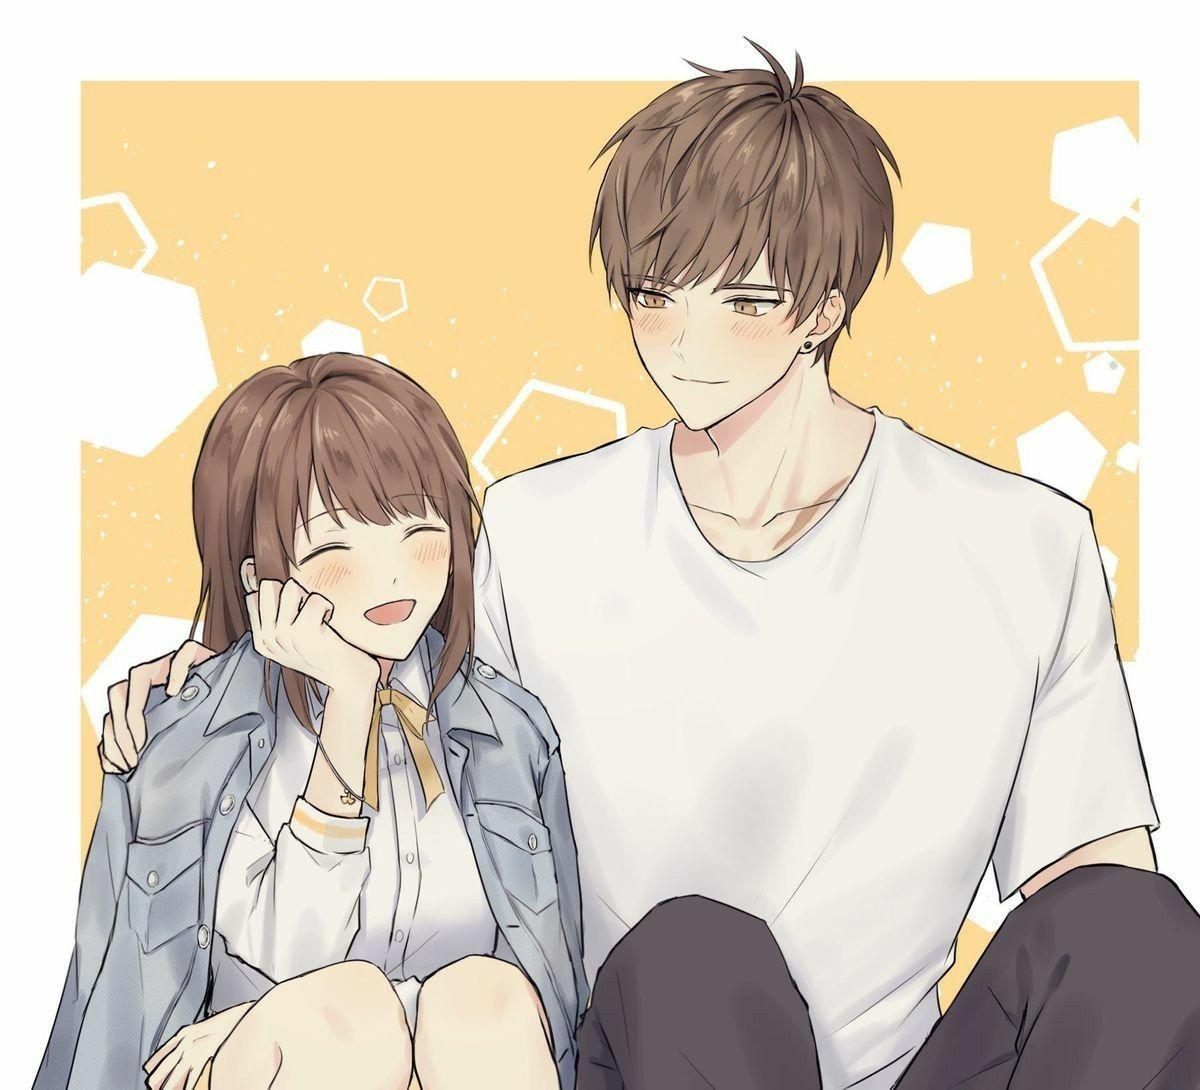 Pin on adorable anime couples